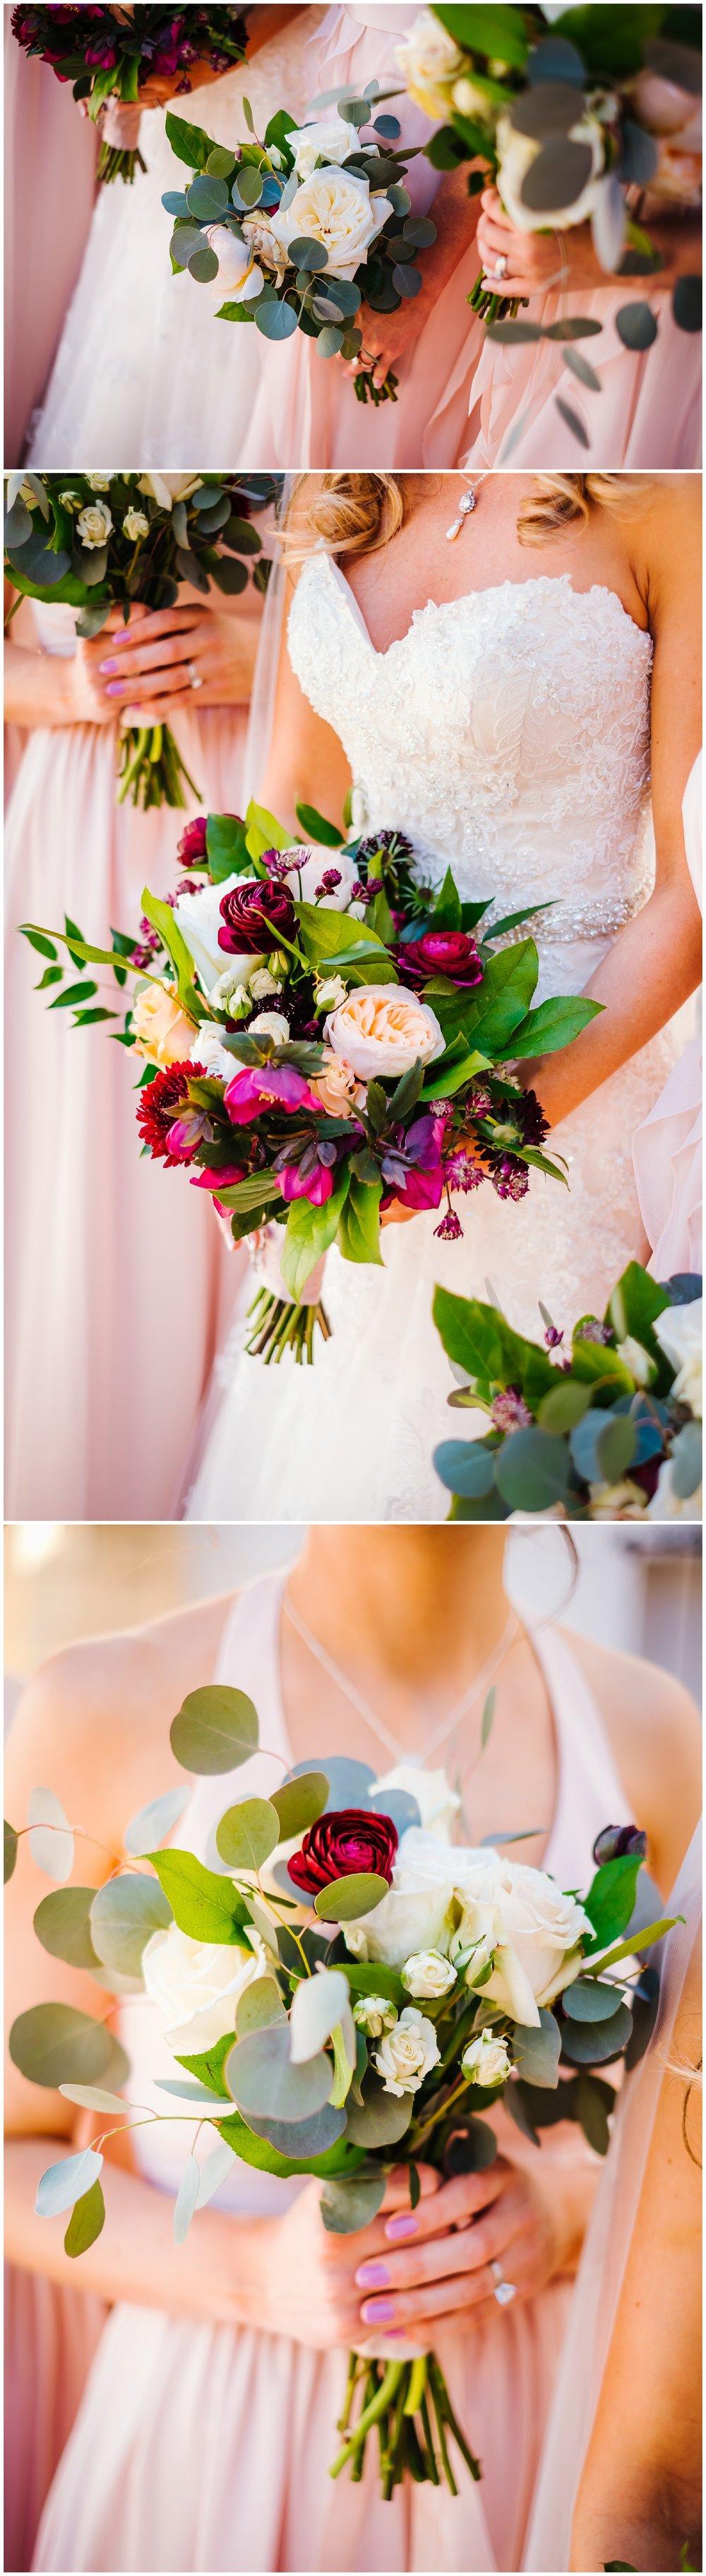 tampa-bradenton-wedding-photographer-south-florida-museum-classic-blush-gold-alpacas-sparklers_0031.jpg